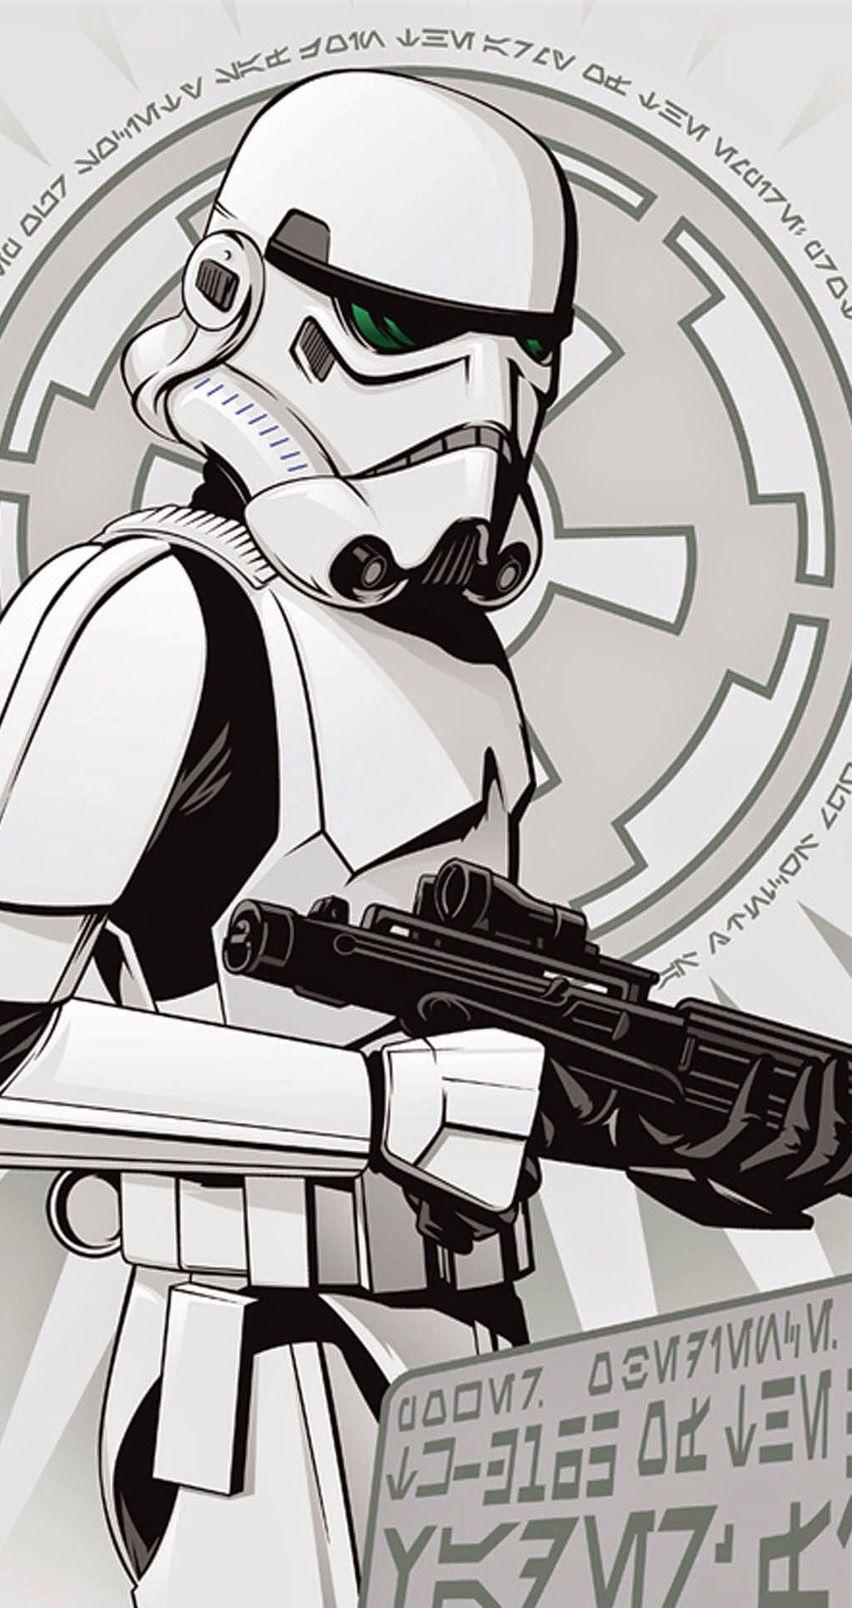 Storm Trooper Star Wars Artwork Star Wars Awesome Star Wars Poster